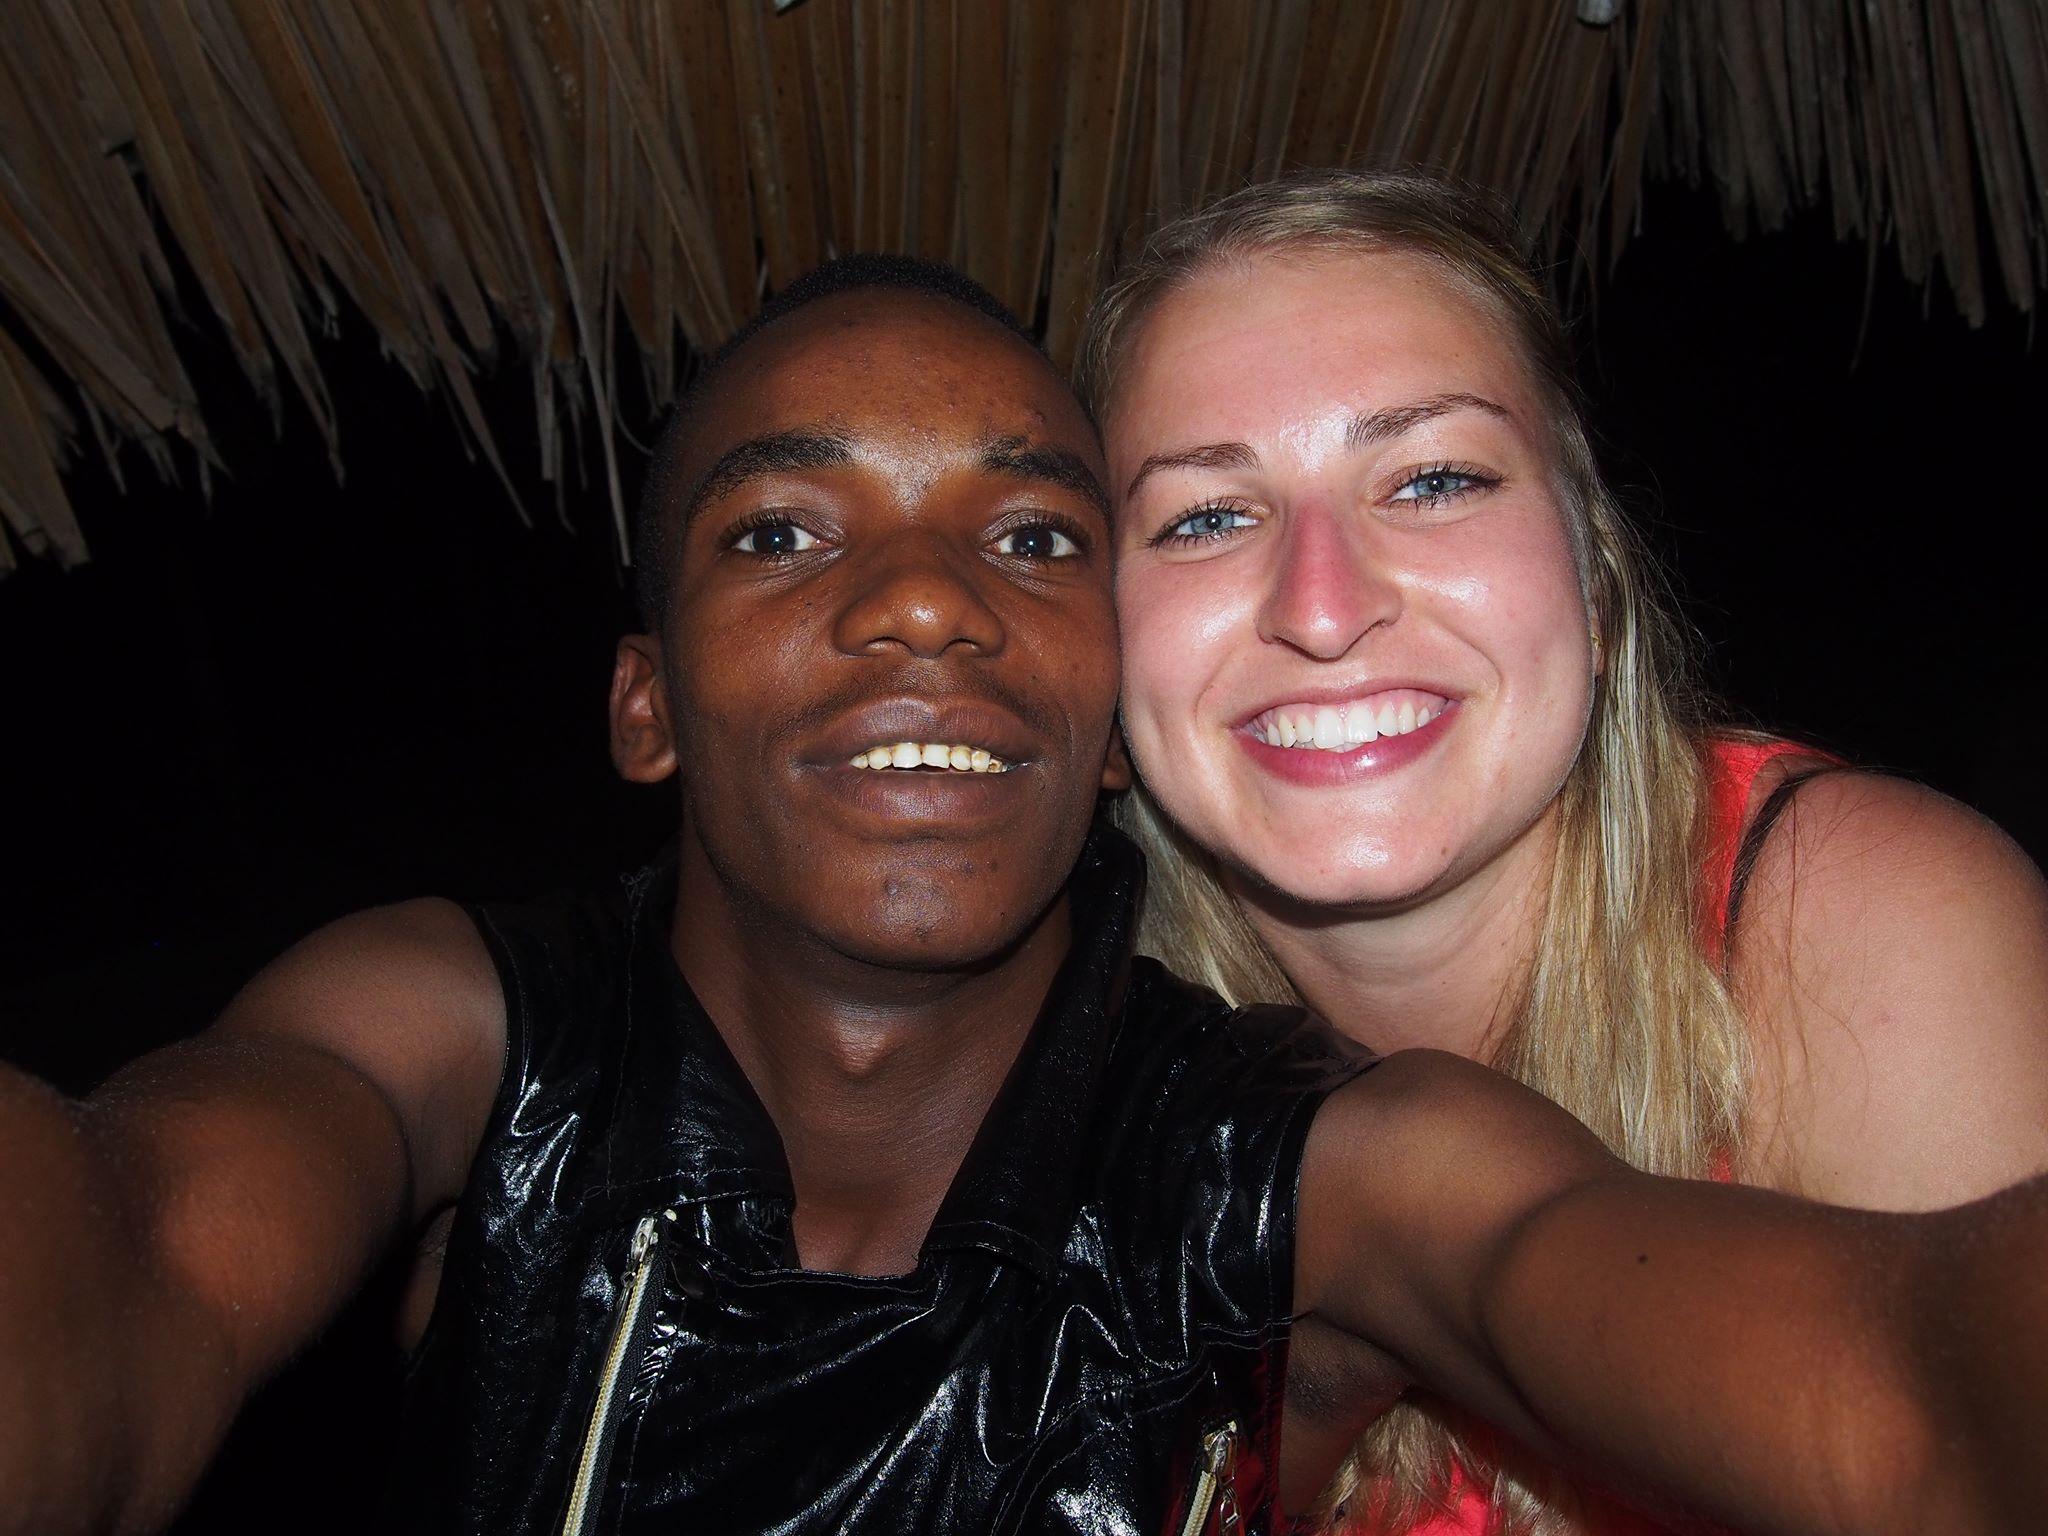 Boyca Moses and Amanda Petersen. Selfie: Boyca Moses.